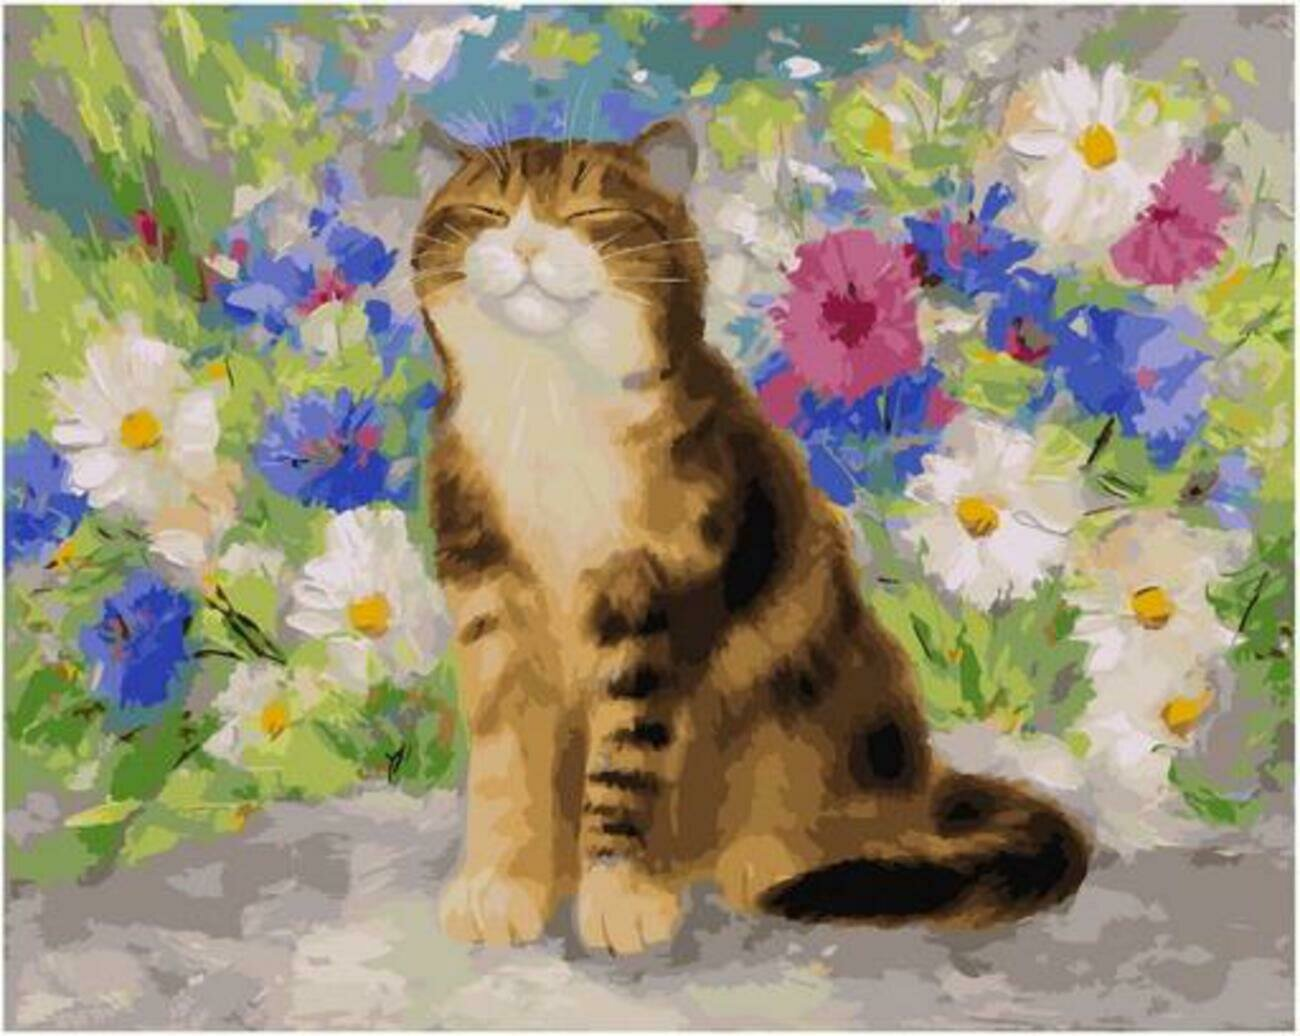 Картина по номерам Paintboy Original PK 90018 Дачник (Котинова Галина) 40x50см